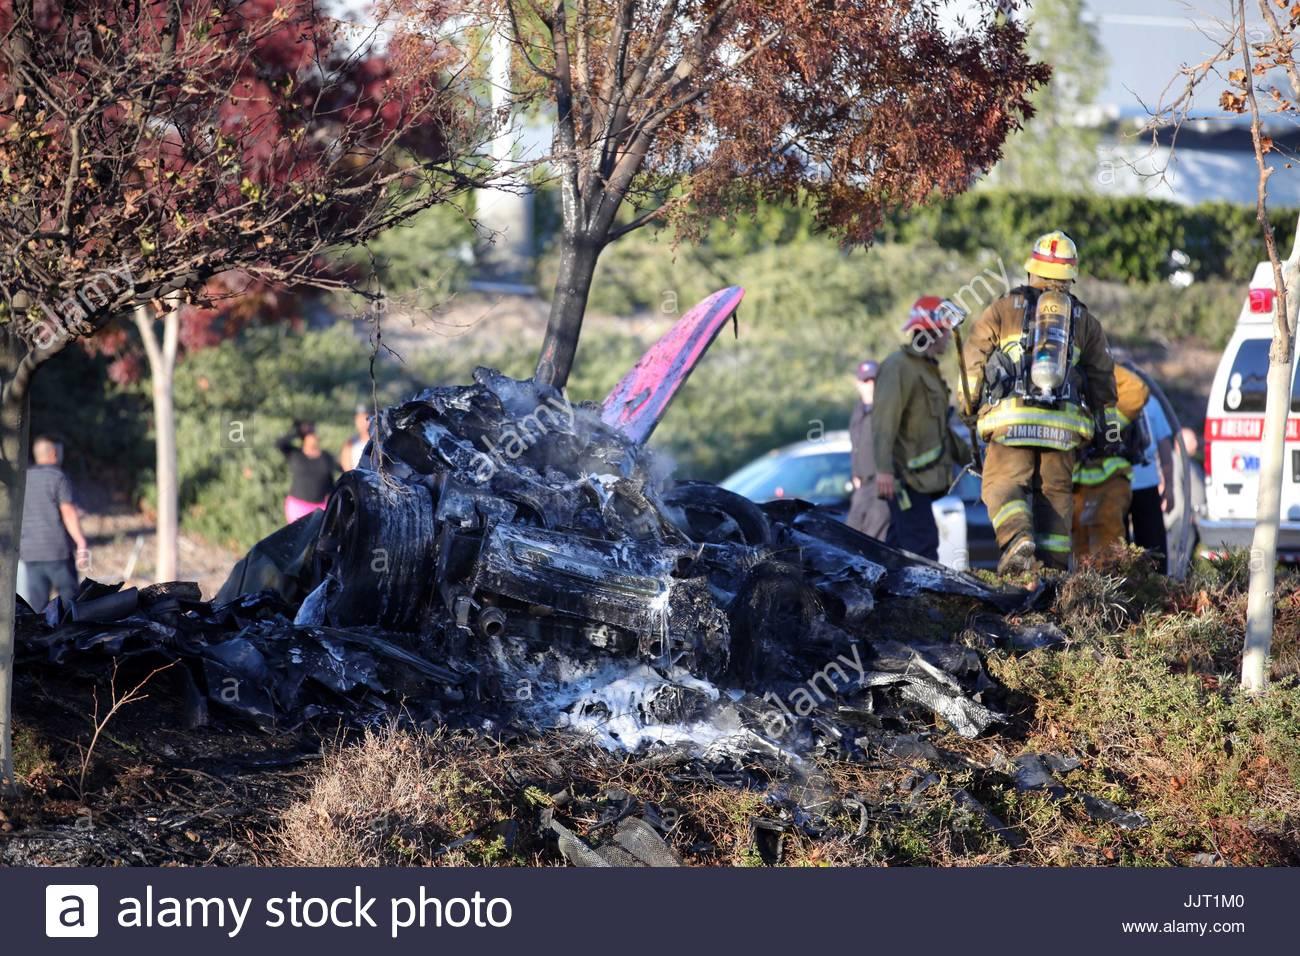 paul walker crash scene the aftermath of the tragic car. Black Bedroom Furniture Sets. Home Design Ideas